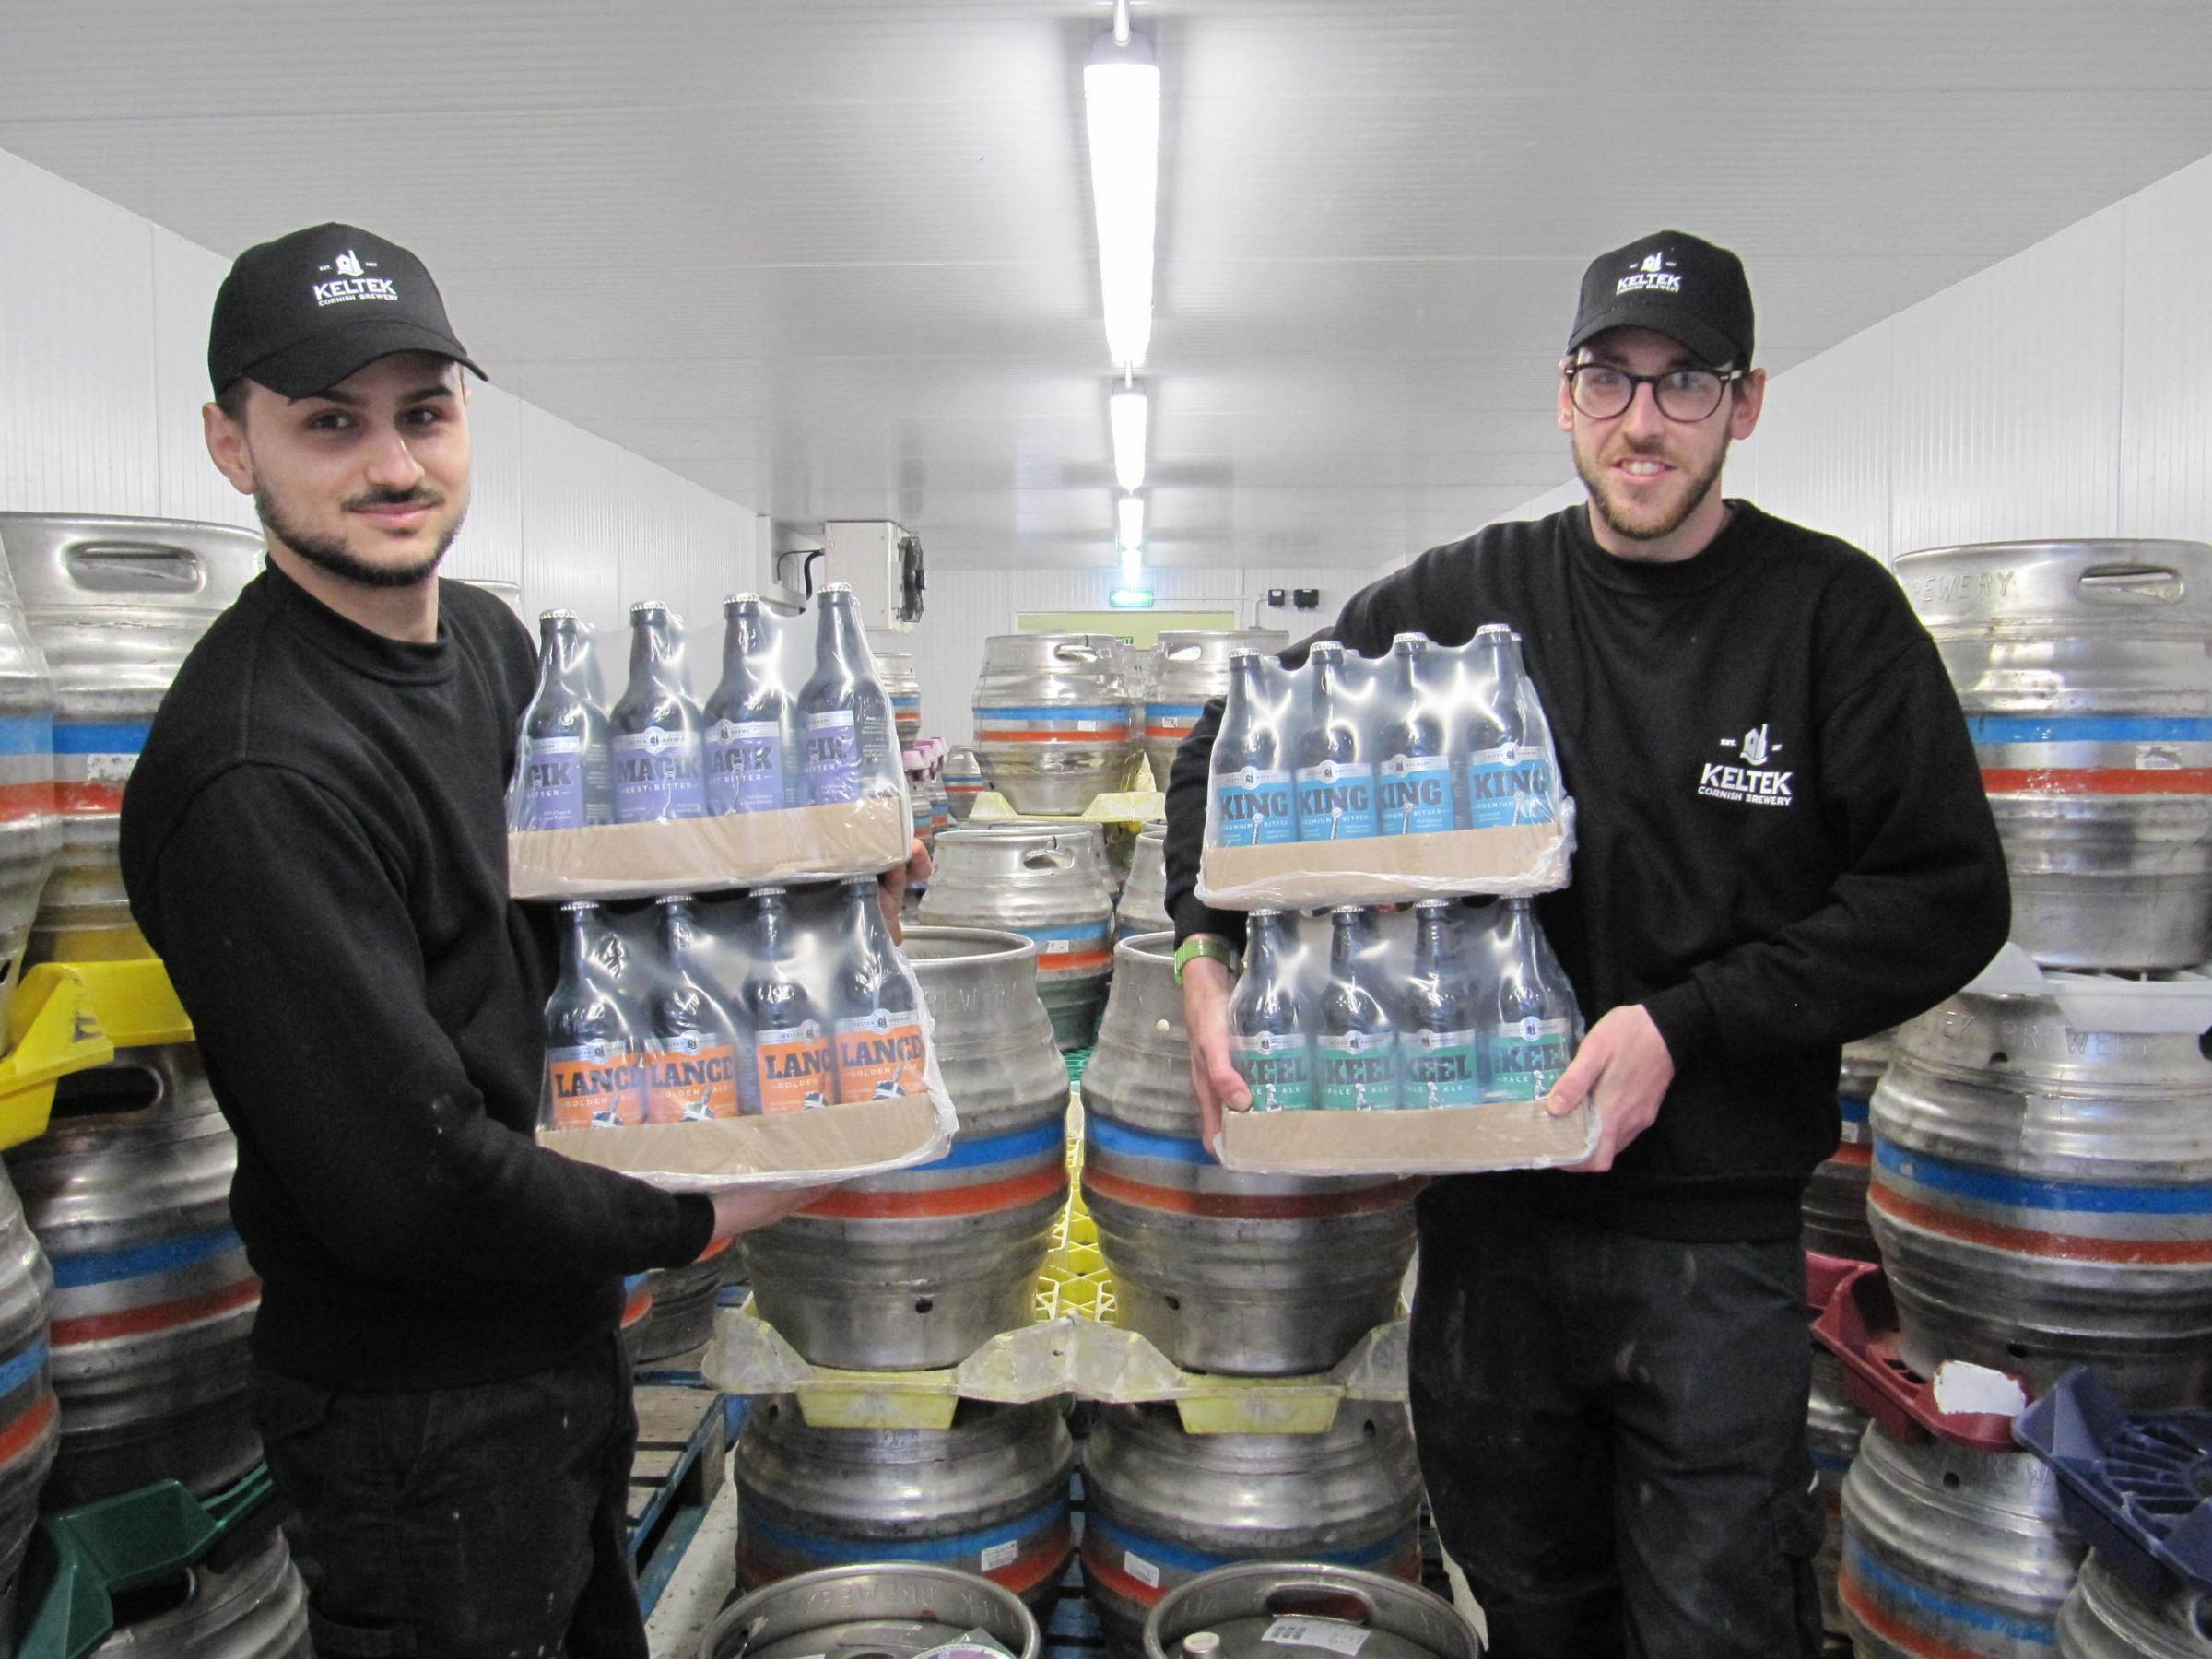 Keltek Cornish Brewery in Redruth raises glass to Co-op